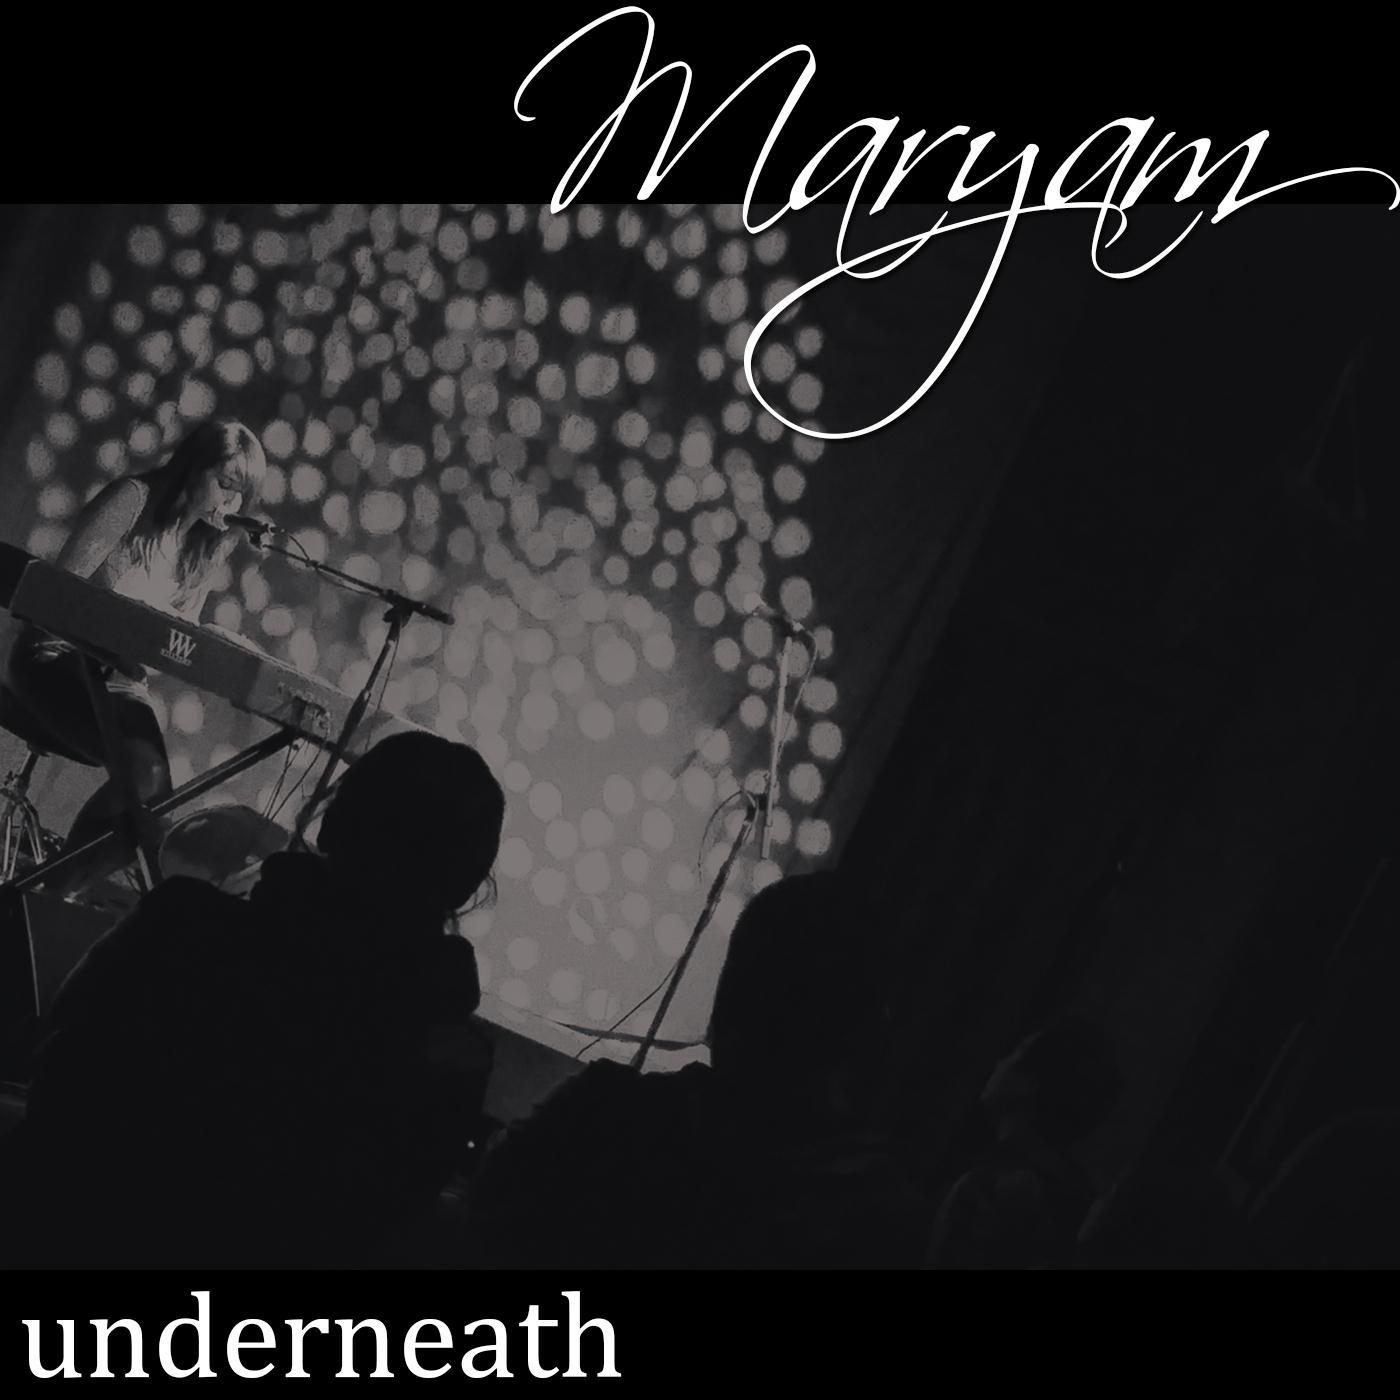 Underneath - Single